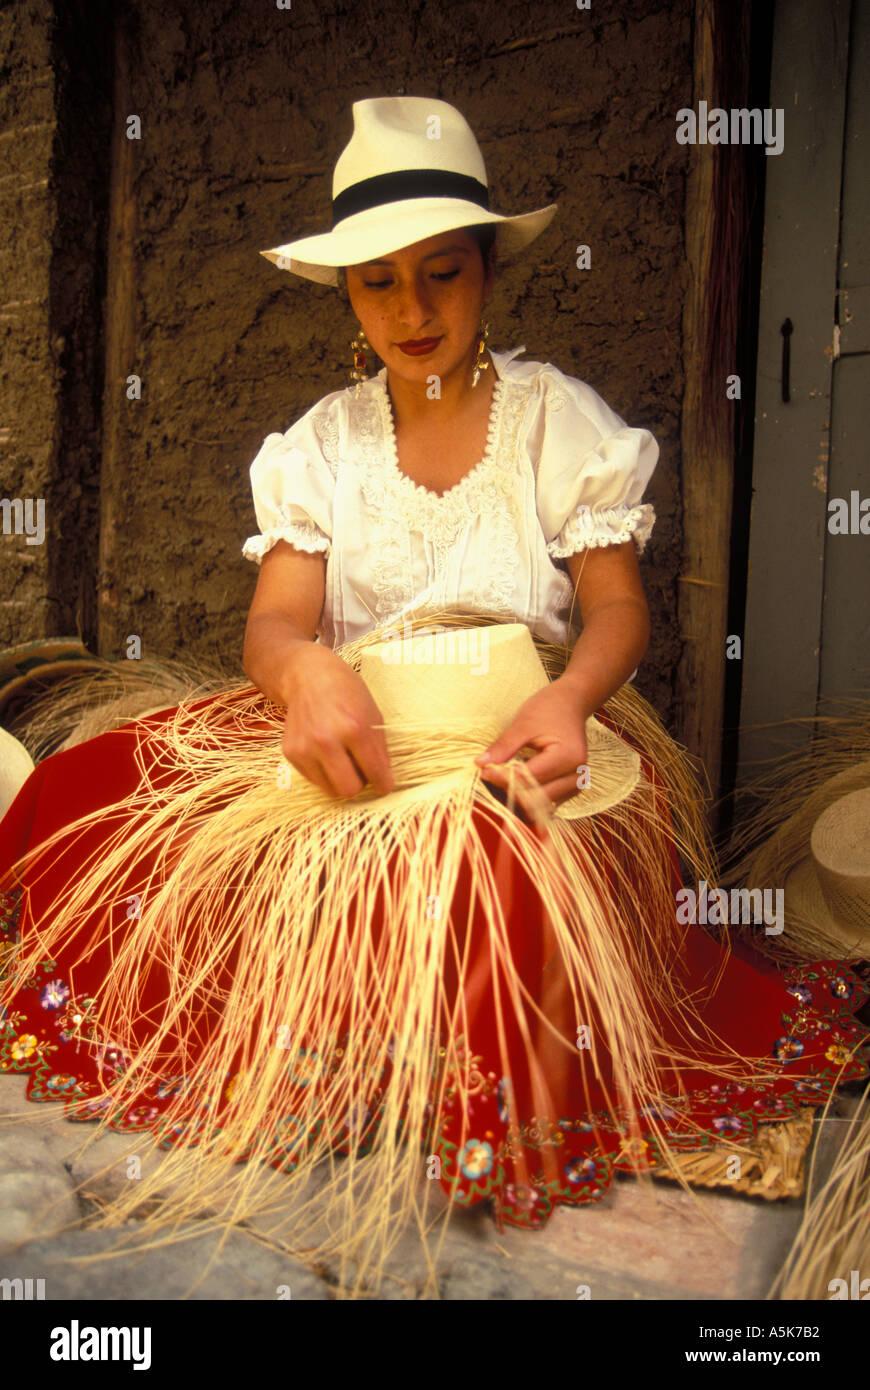 Panama Hut Immagini   Panama Hut Fotos Stock - Alamy 762c75add6ea